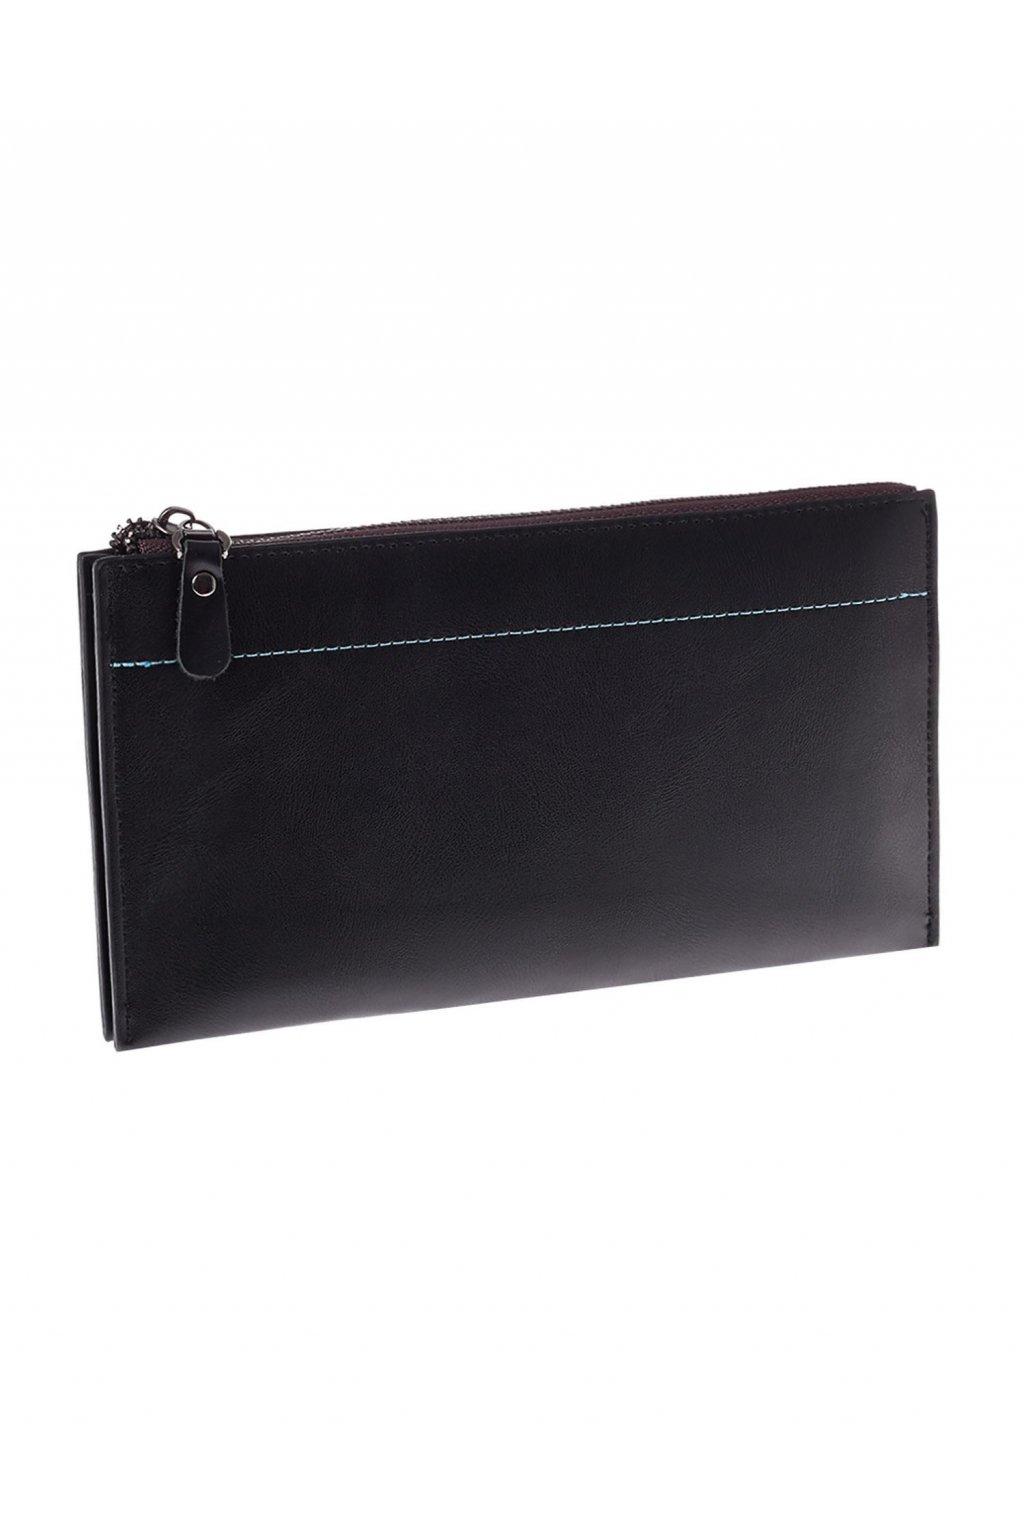 Peňaženka kód CE-PR-SF-1812.07